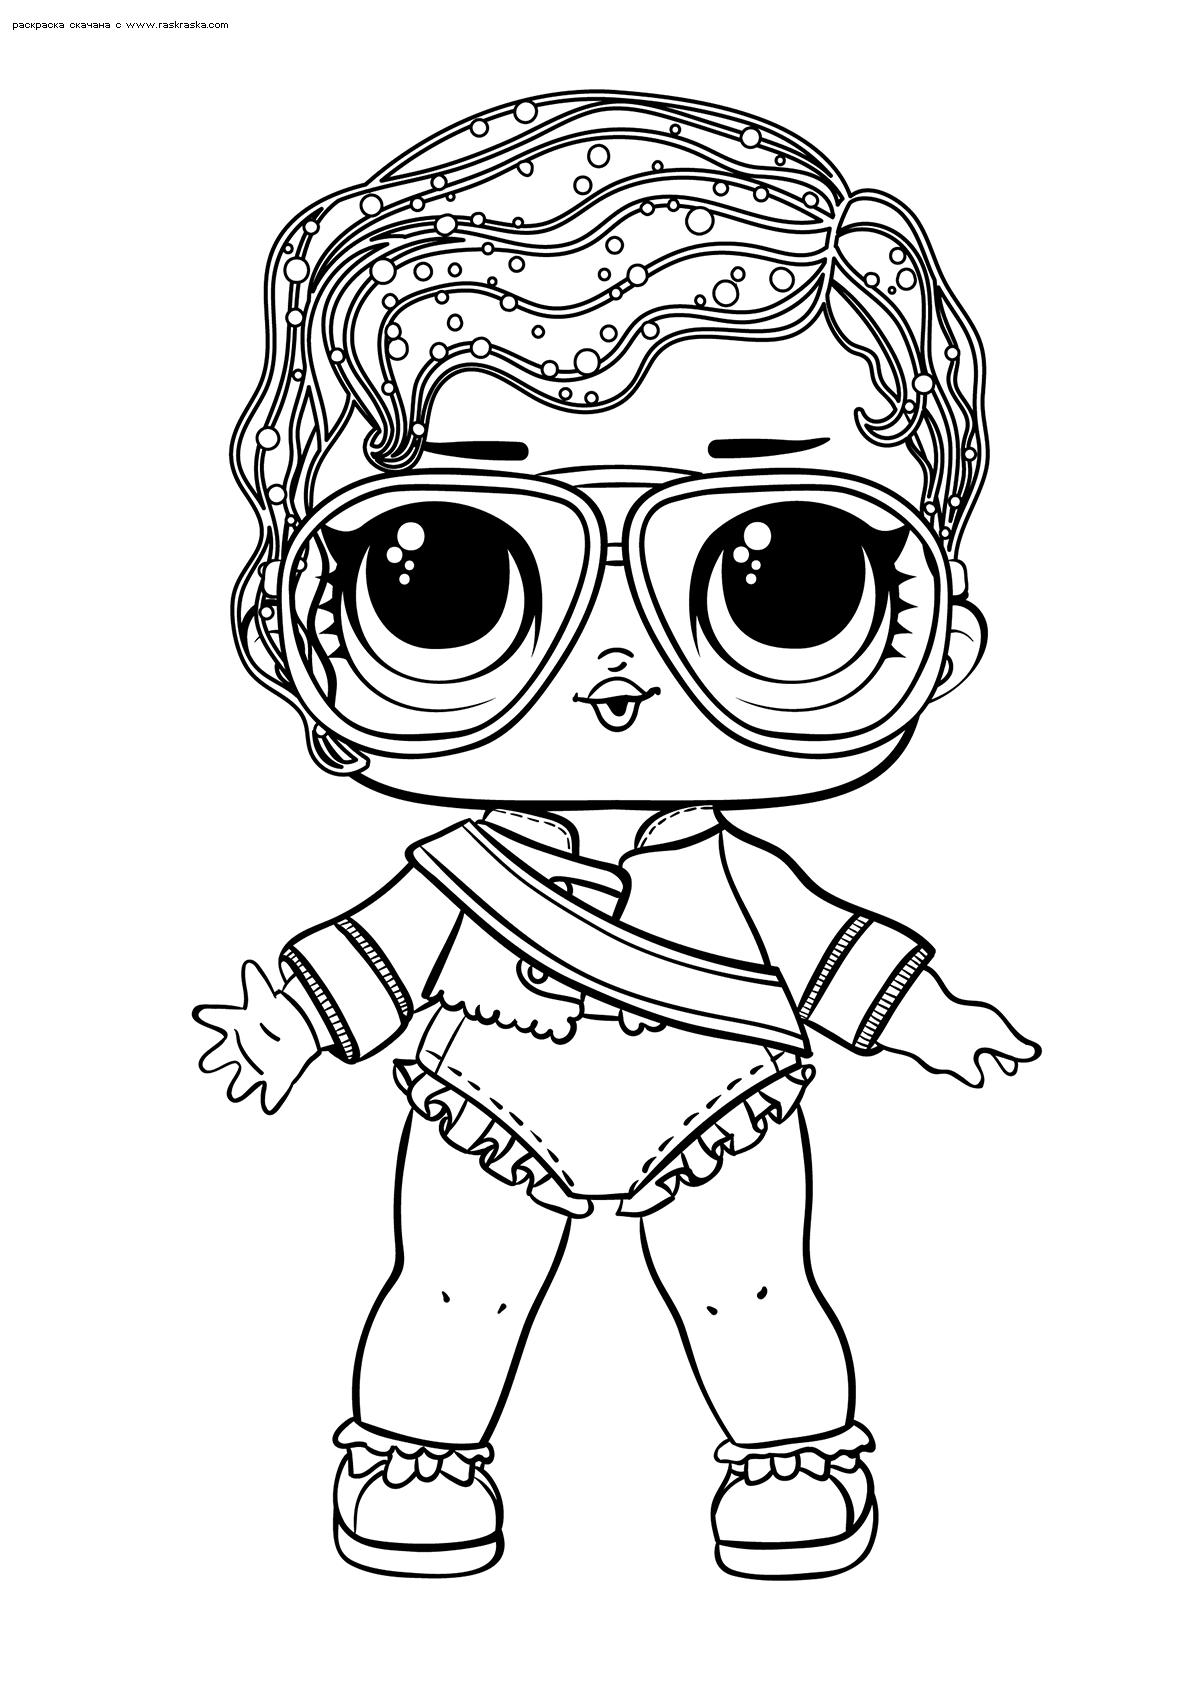 Раскраска ЛОЛ Shimone Queen (Майкл Джэксон) | Раскраски ...